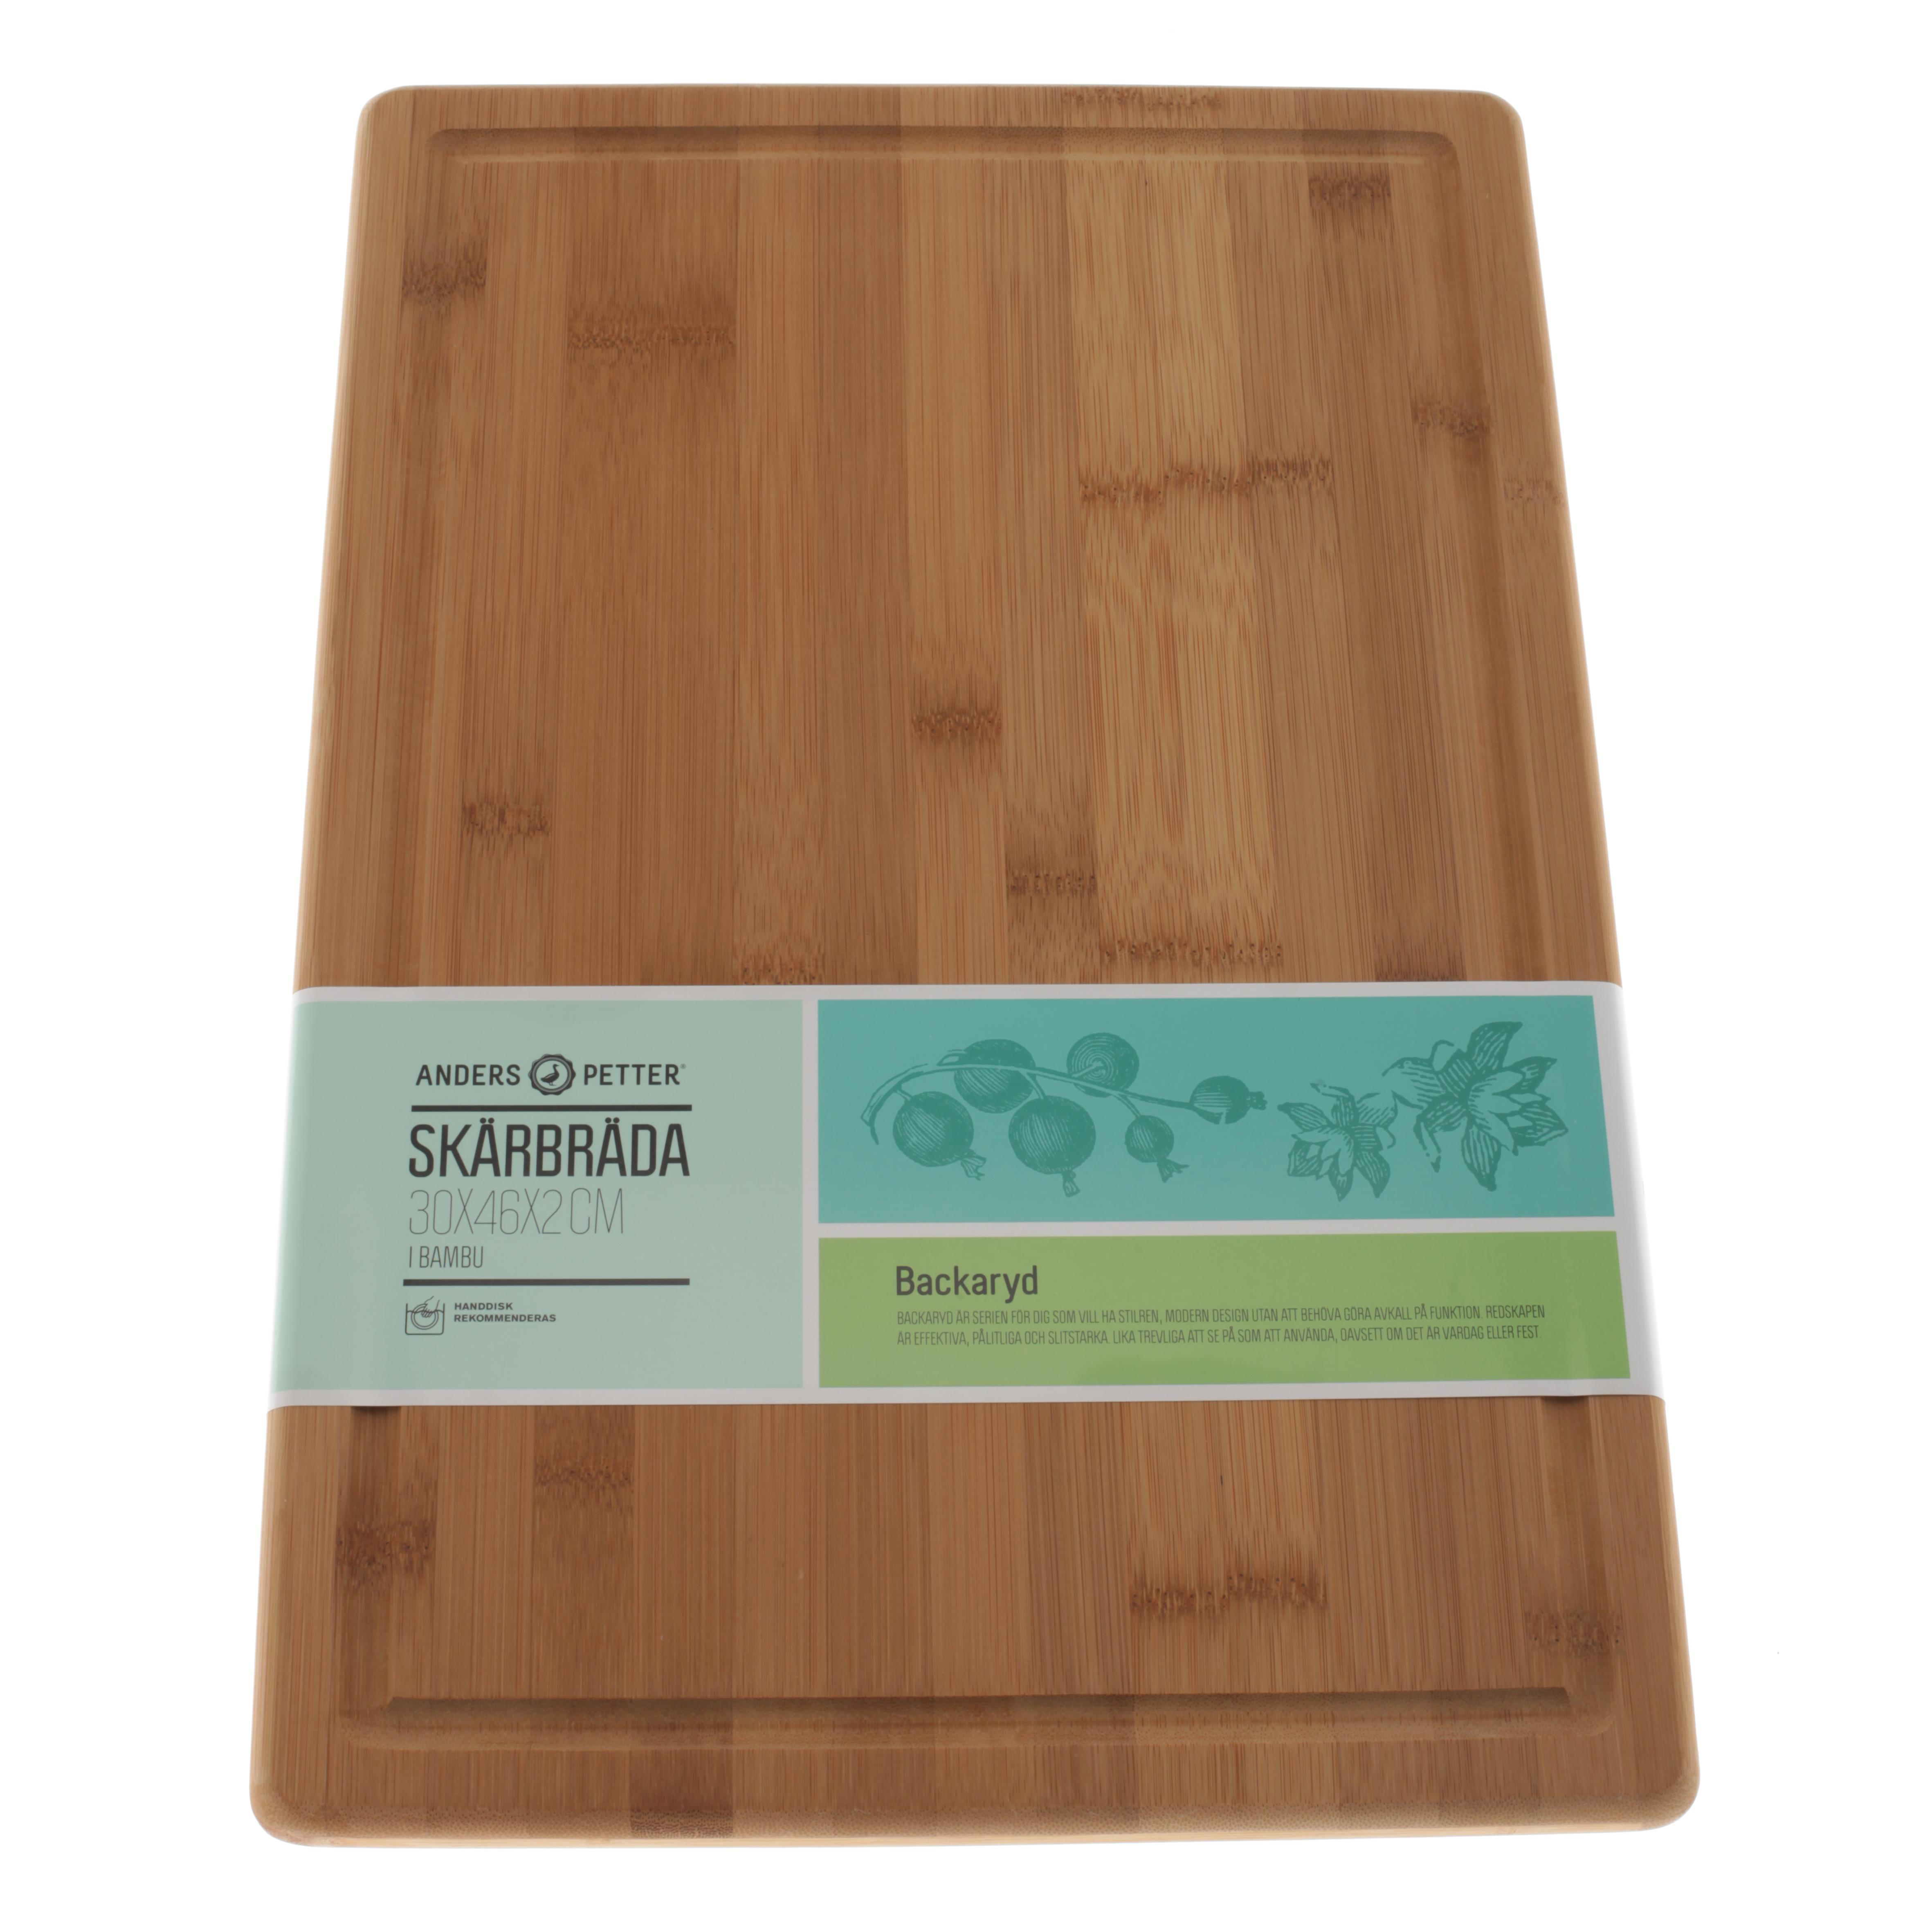 Backaryd Skärbräda i bambu 30x46 cm